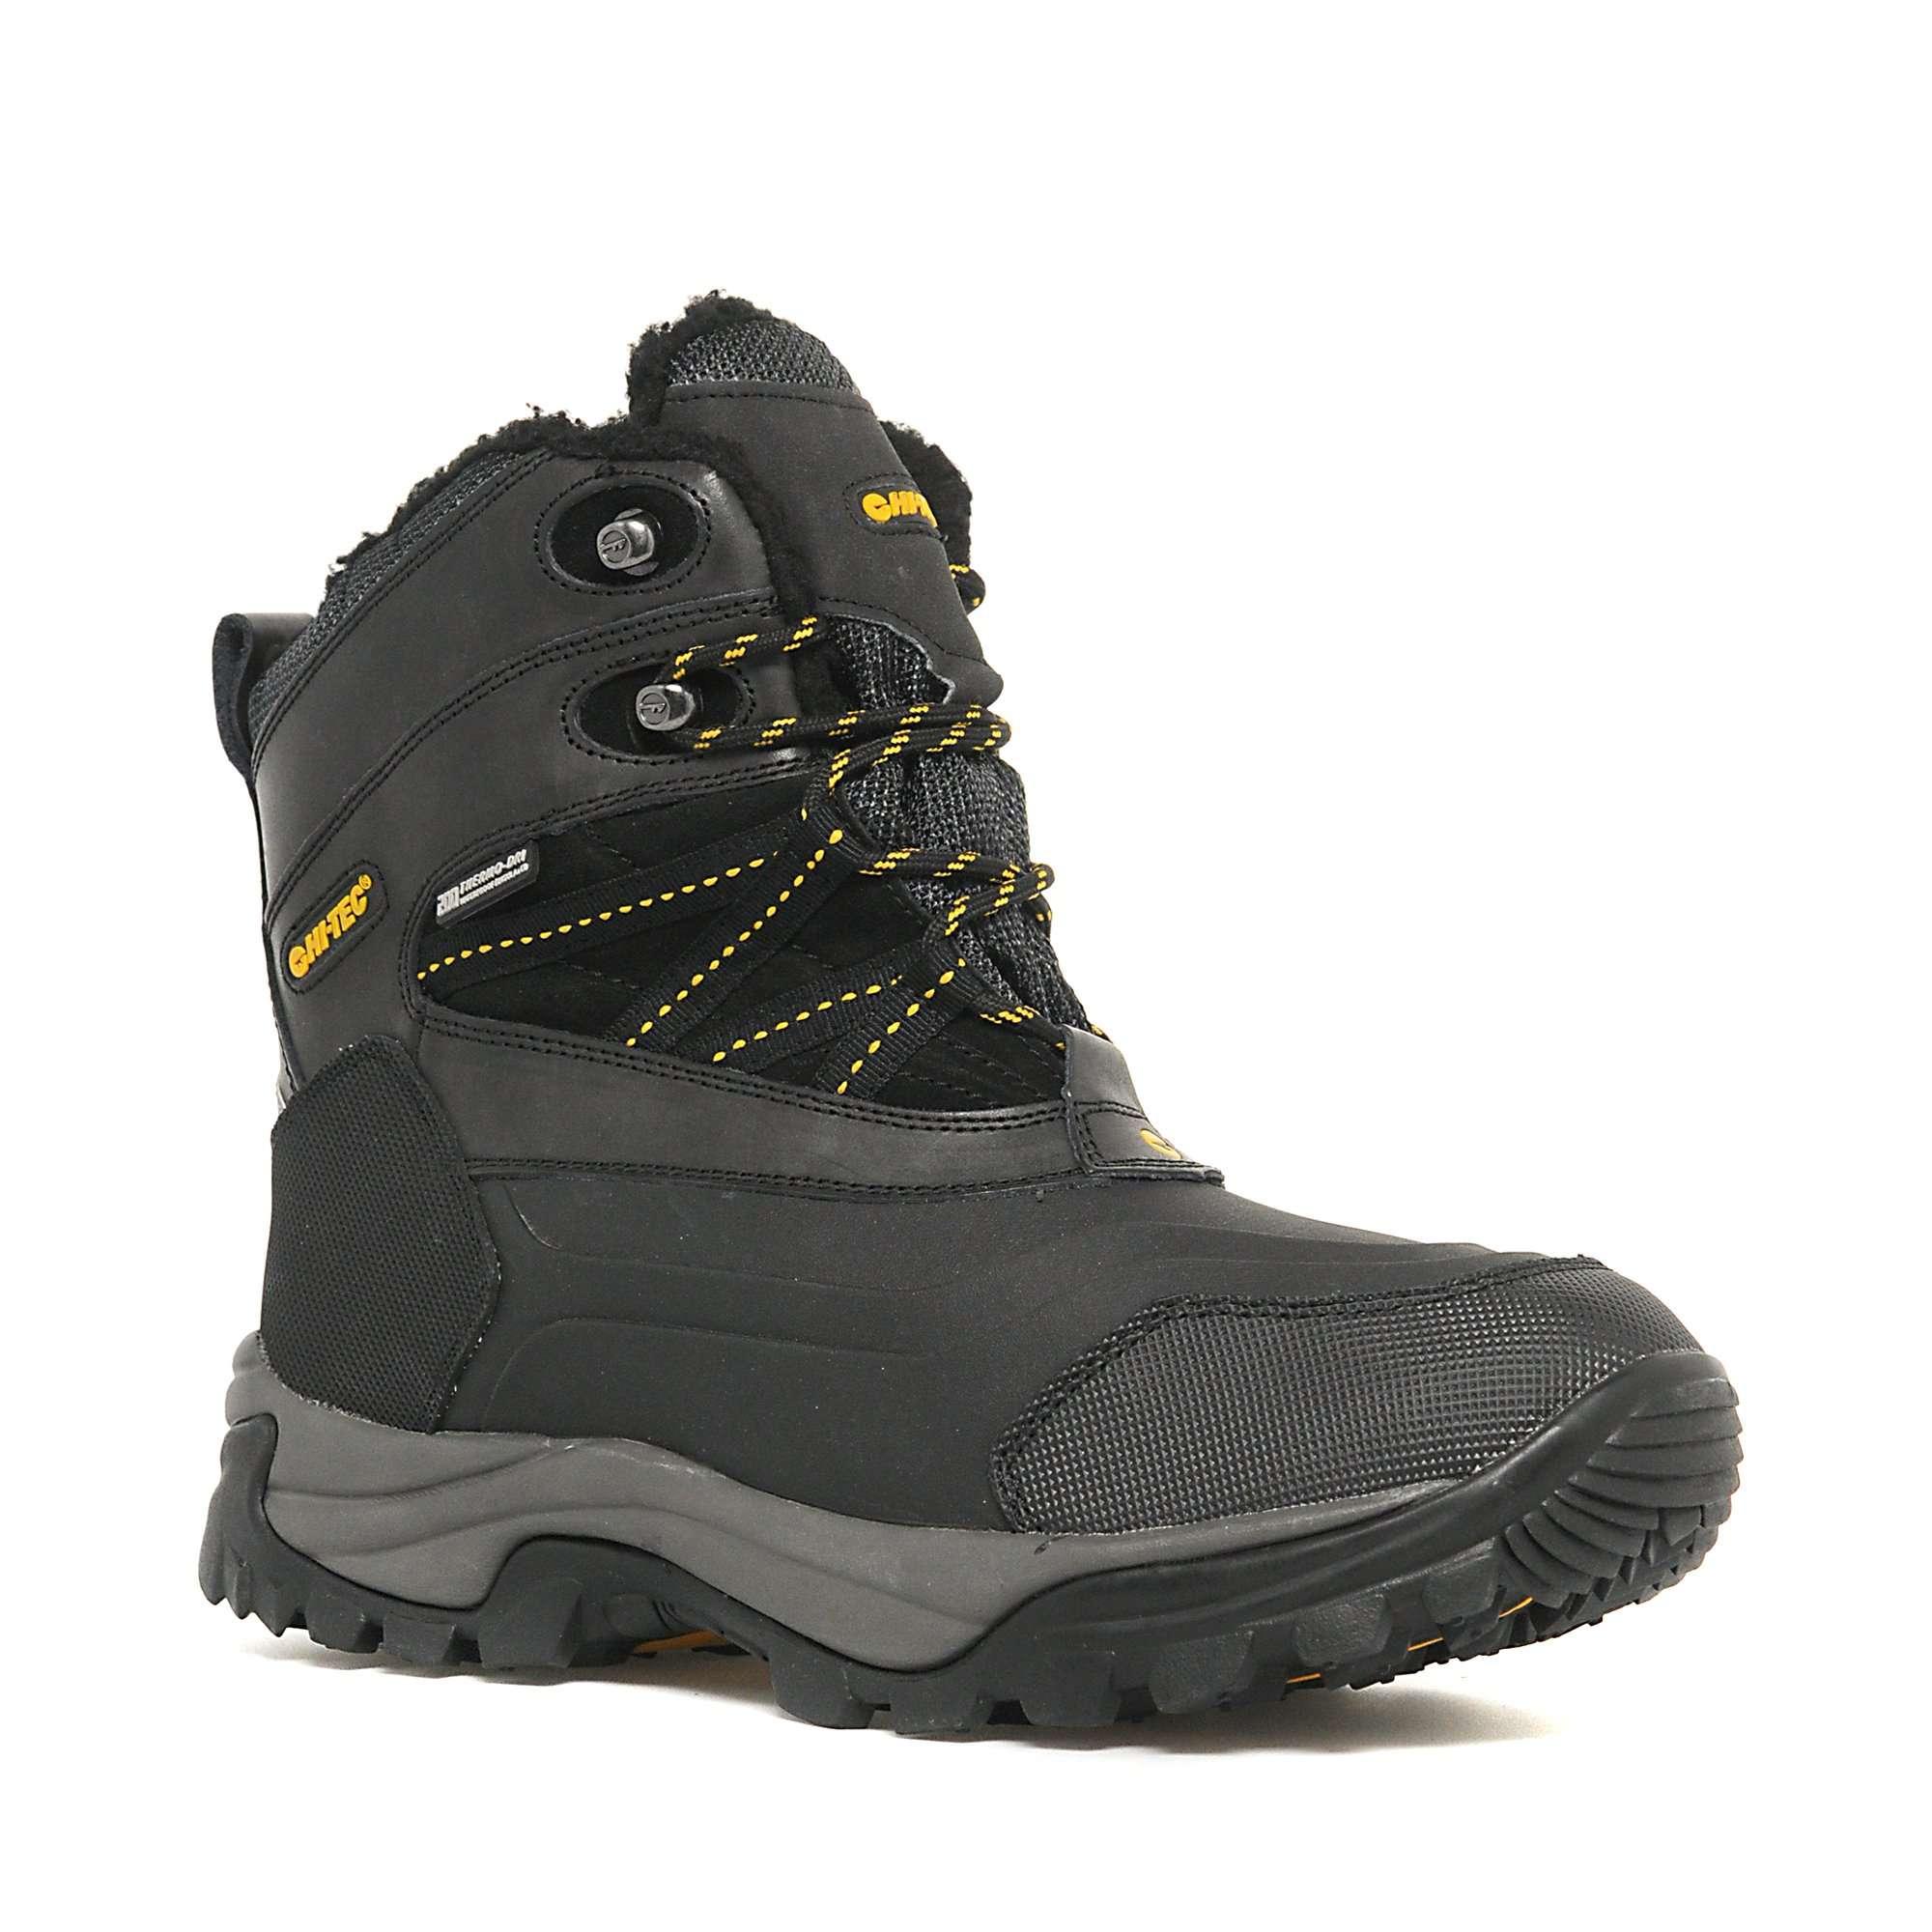 HI TEC Men's Snow Peak 200 Waterproof Winter Boot